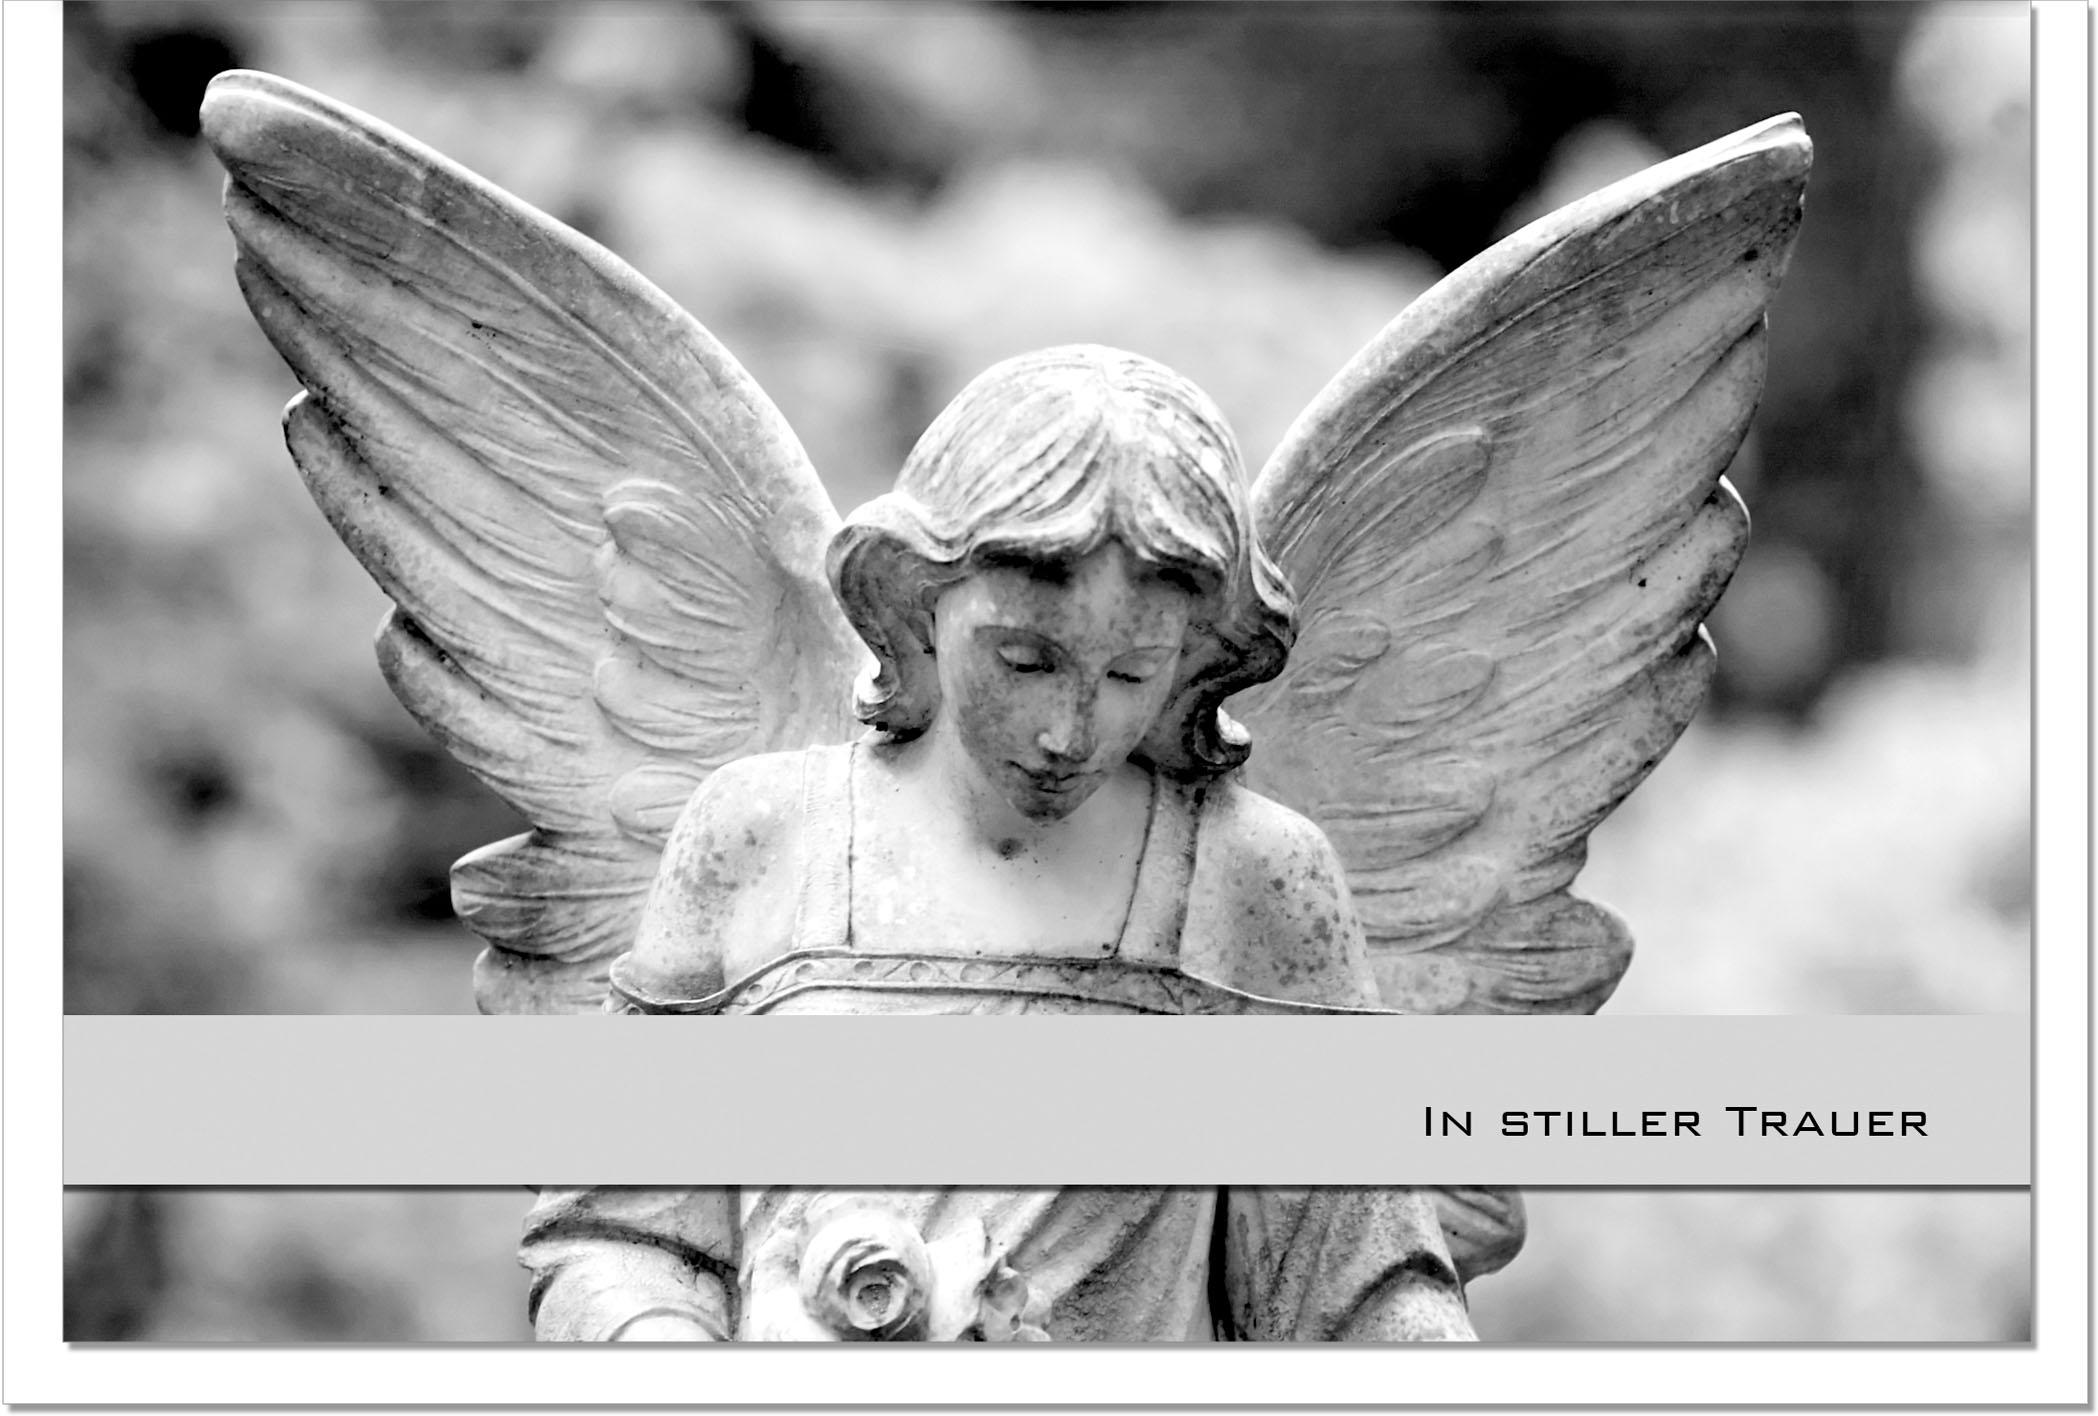 Trauerkarte Beileidskarte / Engel